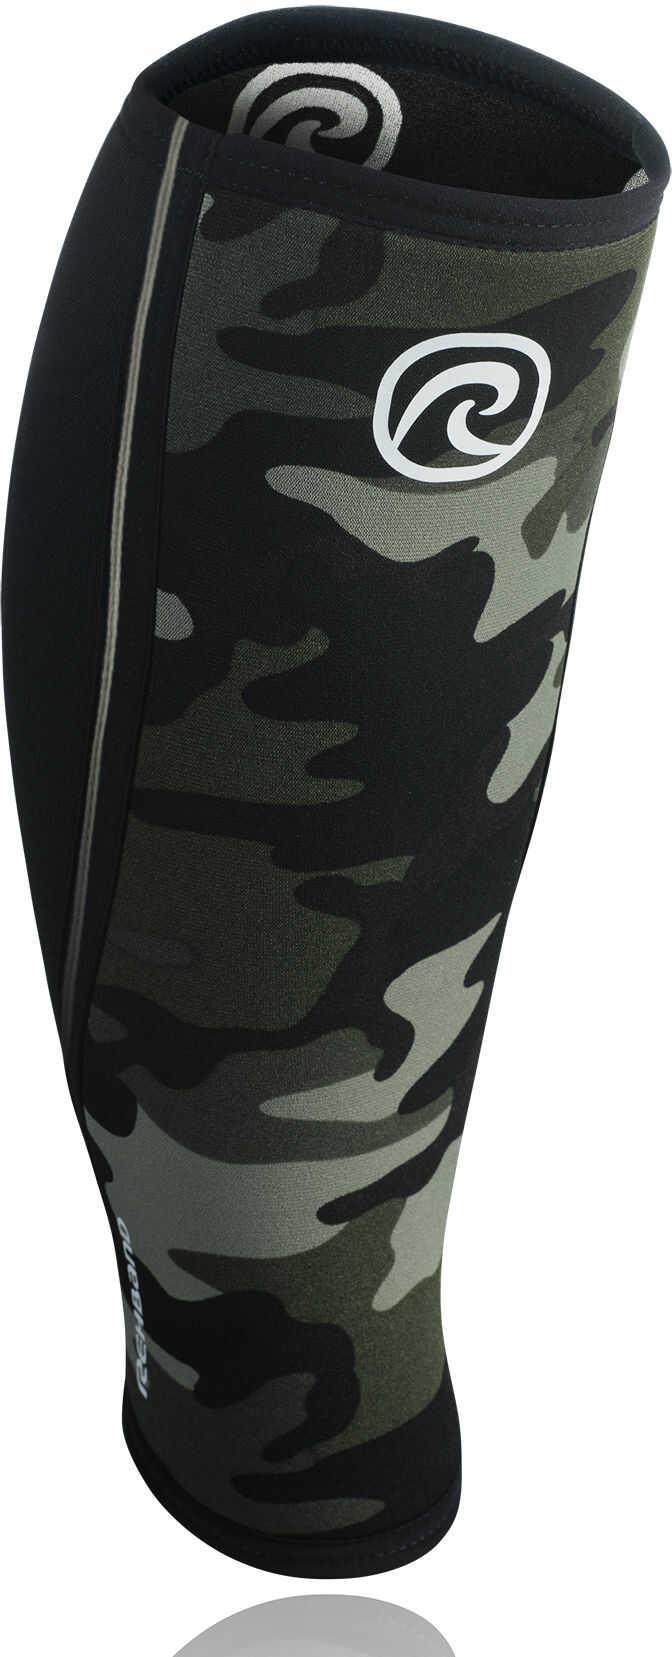 Stabilizator łydki Rx 106317-03 Rehband 5 mm (moro)